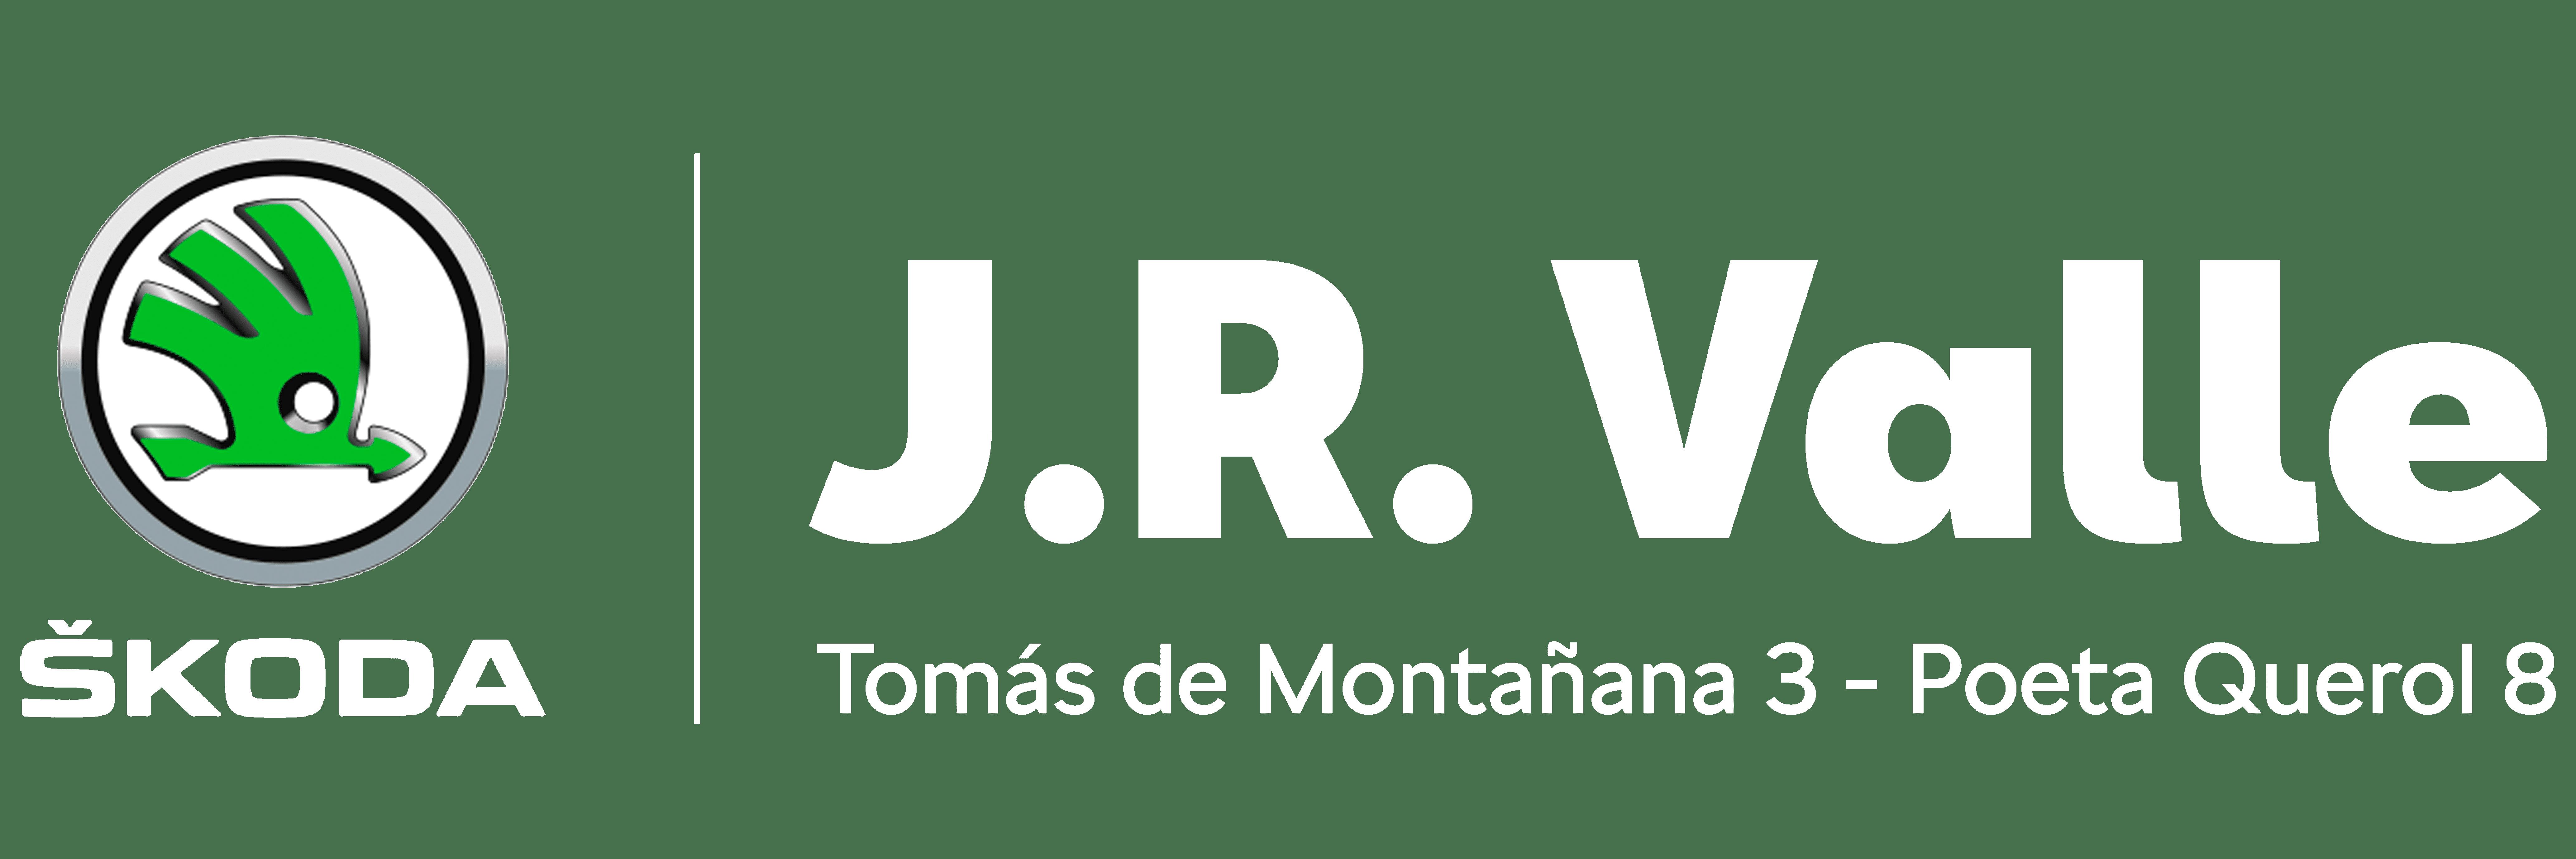 logo-SKODA-JRValle-blanco-horizontal